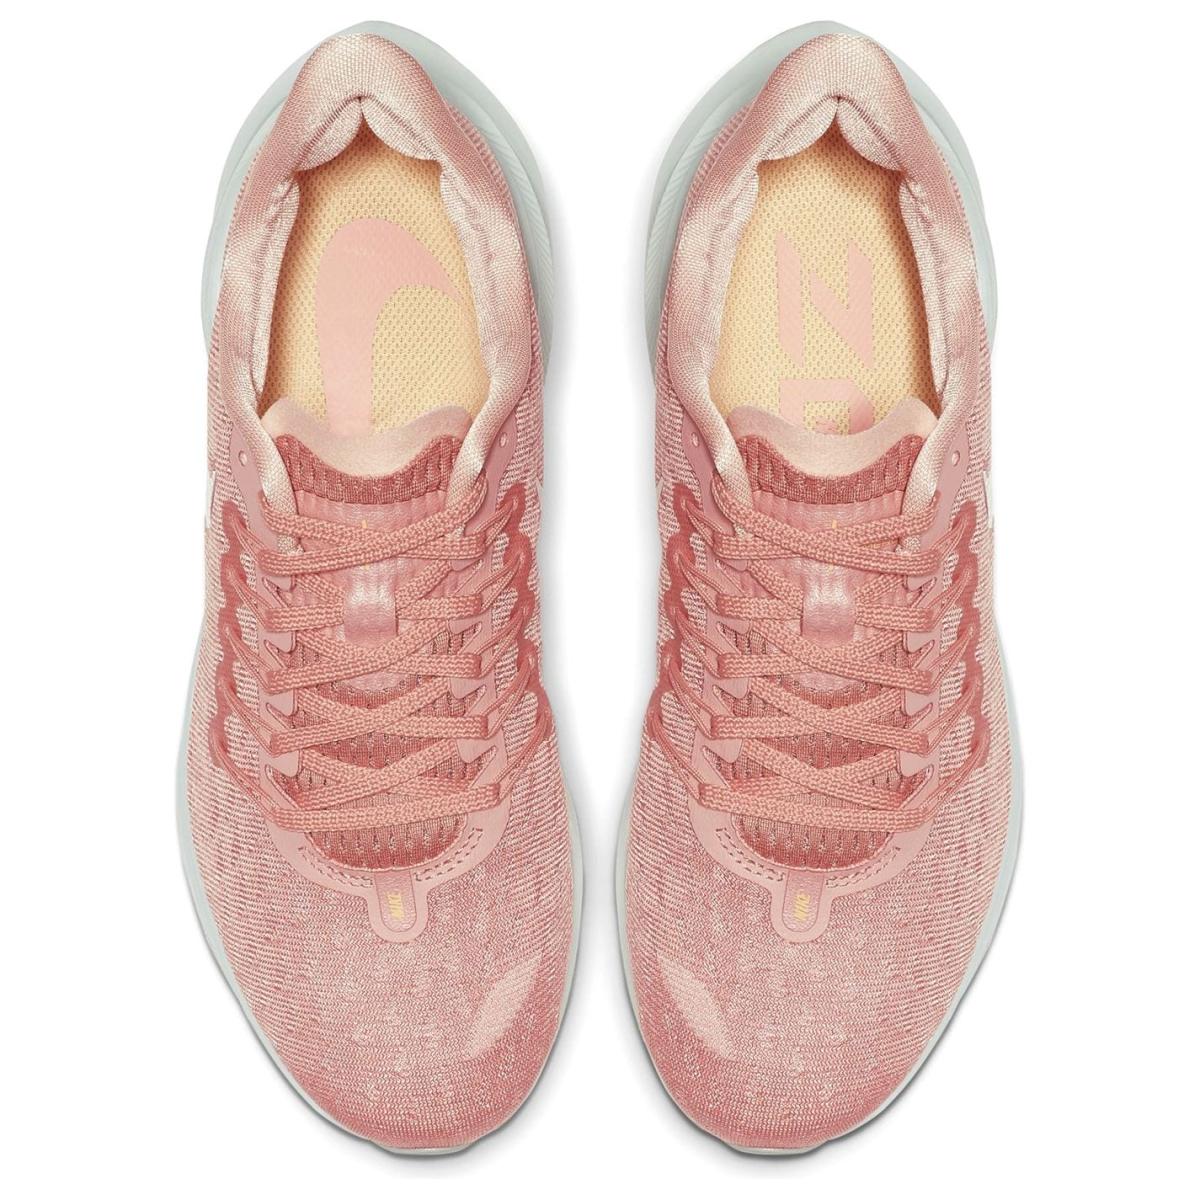 Nike-Zoom-Vomero-14-Turnschuhe-Damen-Sneaker-Sportschuhe-Laufschuhe-4165 Indexbild 6